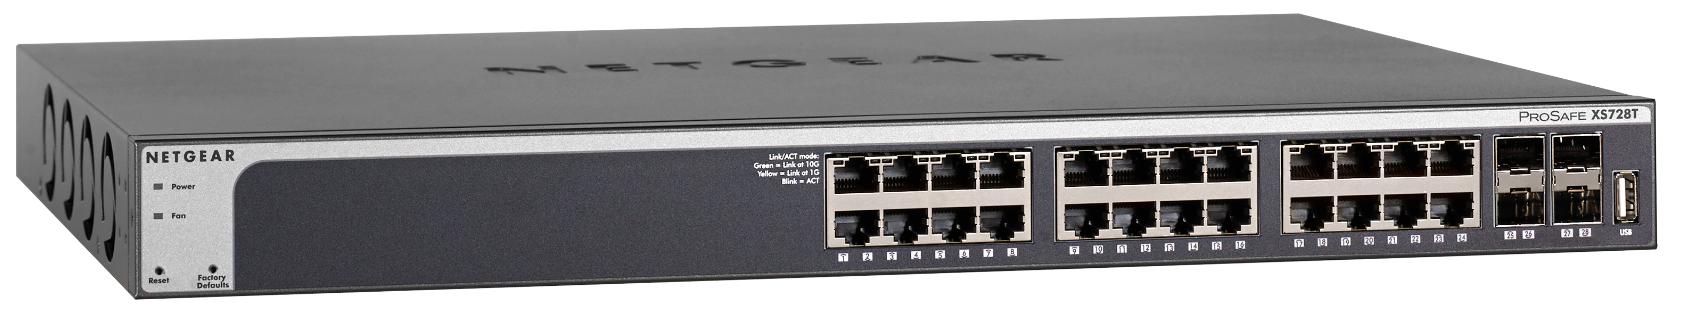 NETGEAR 28PT 10G SMART SWITCH W/4 SFP+, XS728T